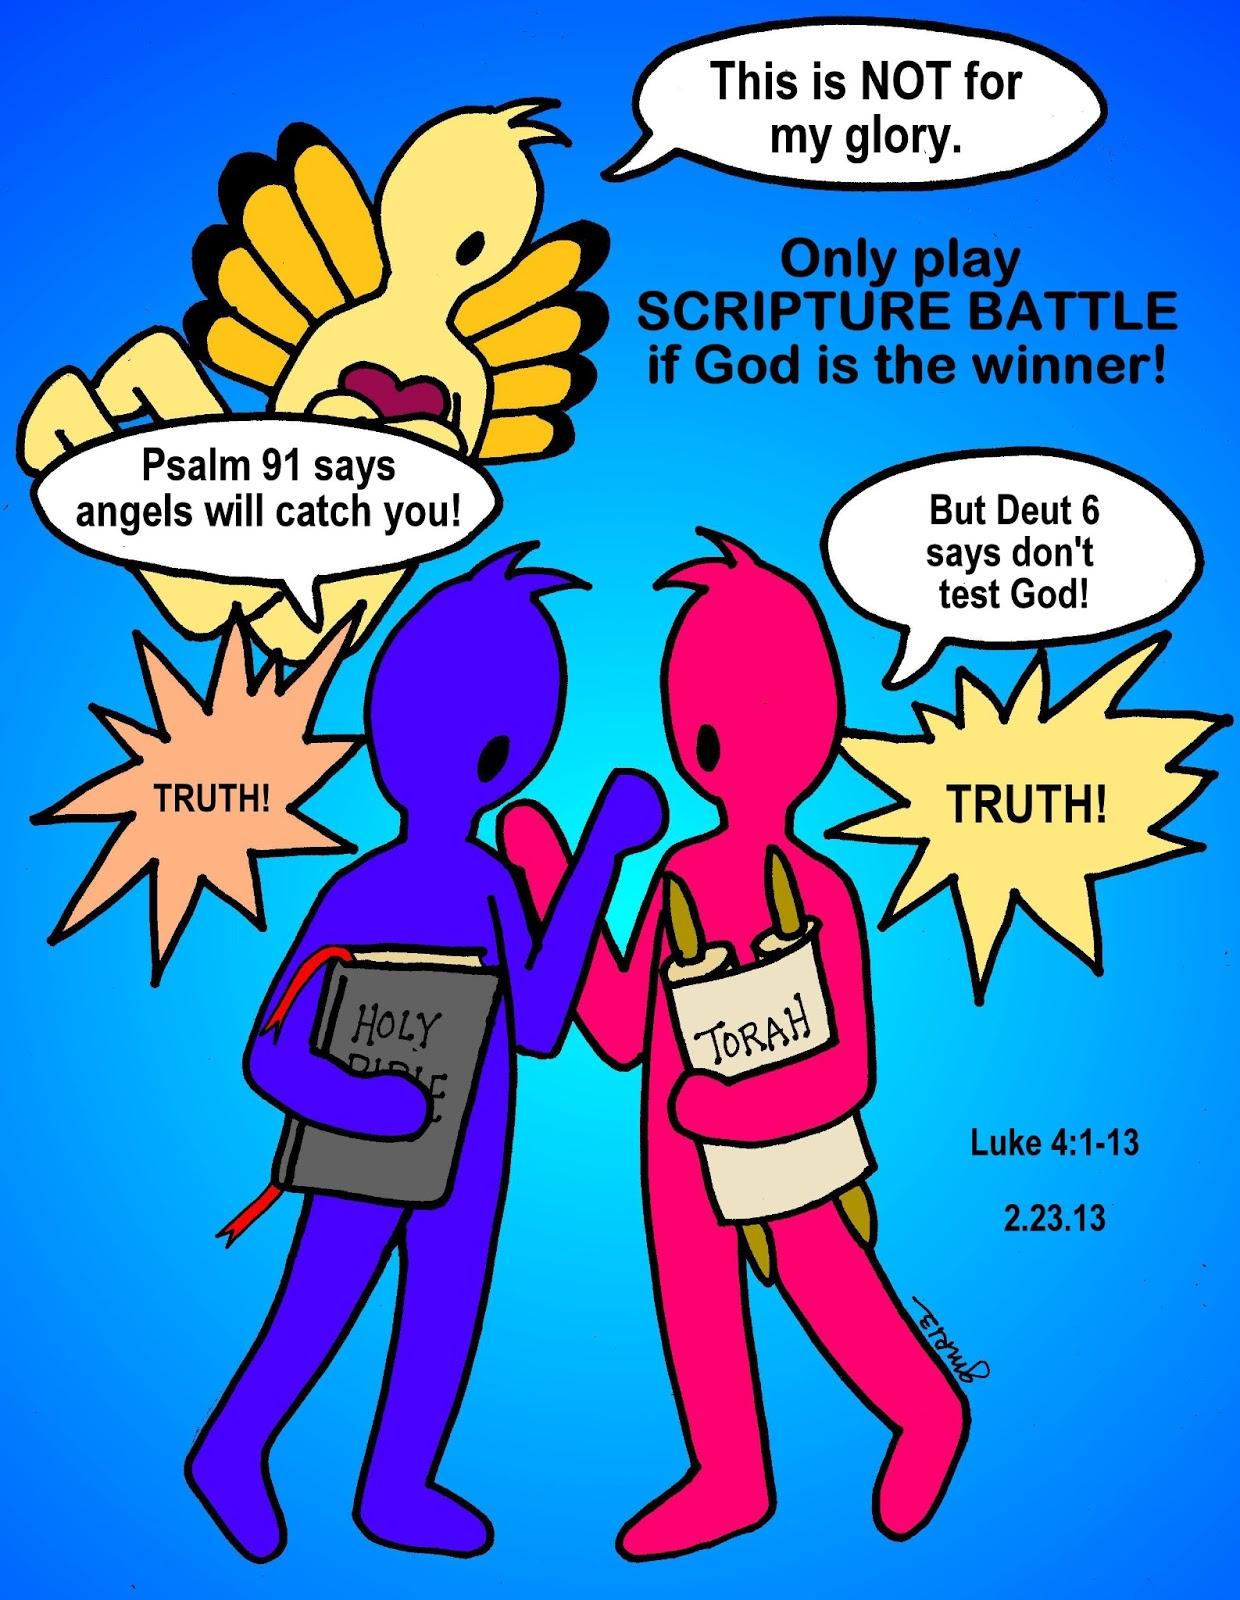 [Image: 728610366-2_23_13_Scripture_Battle_.jpg]